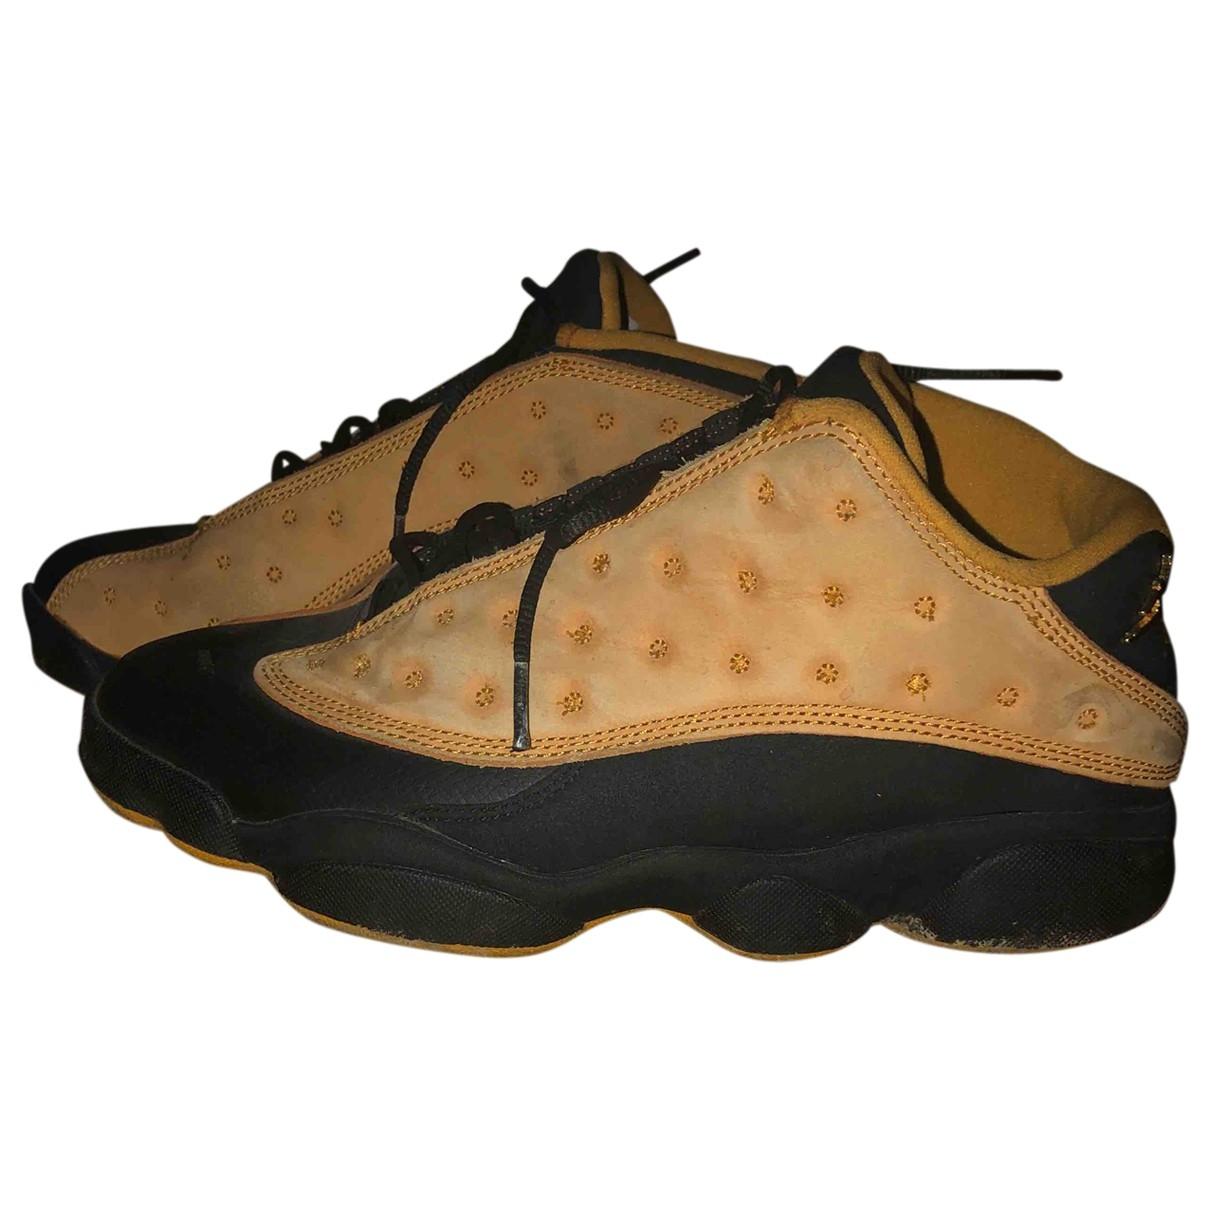 Jordan - Baskets Air Jordan 13 pour homme en suede - beige